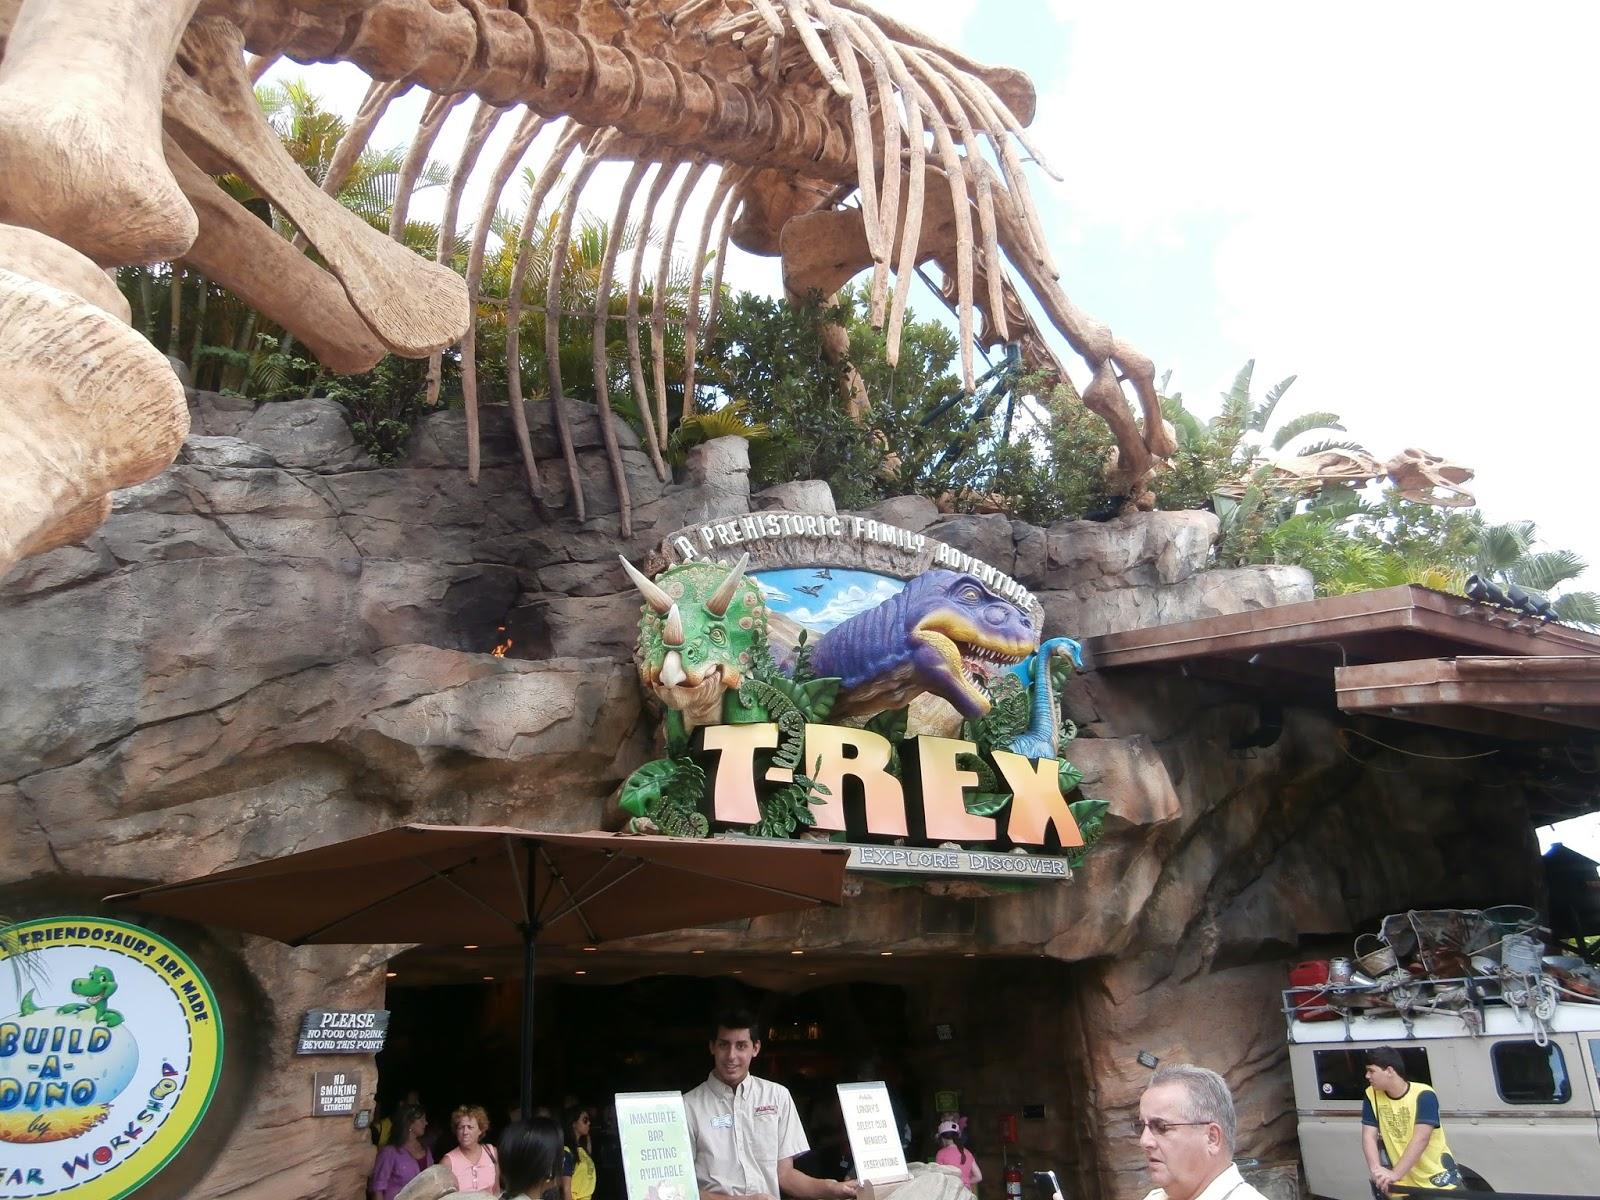 T rex restaurant coupons